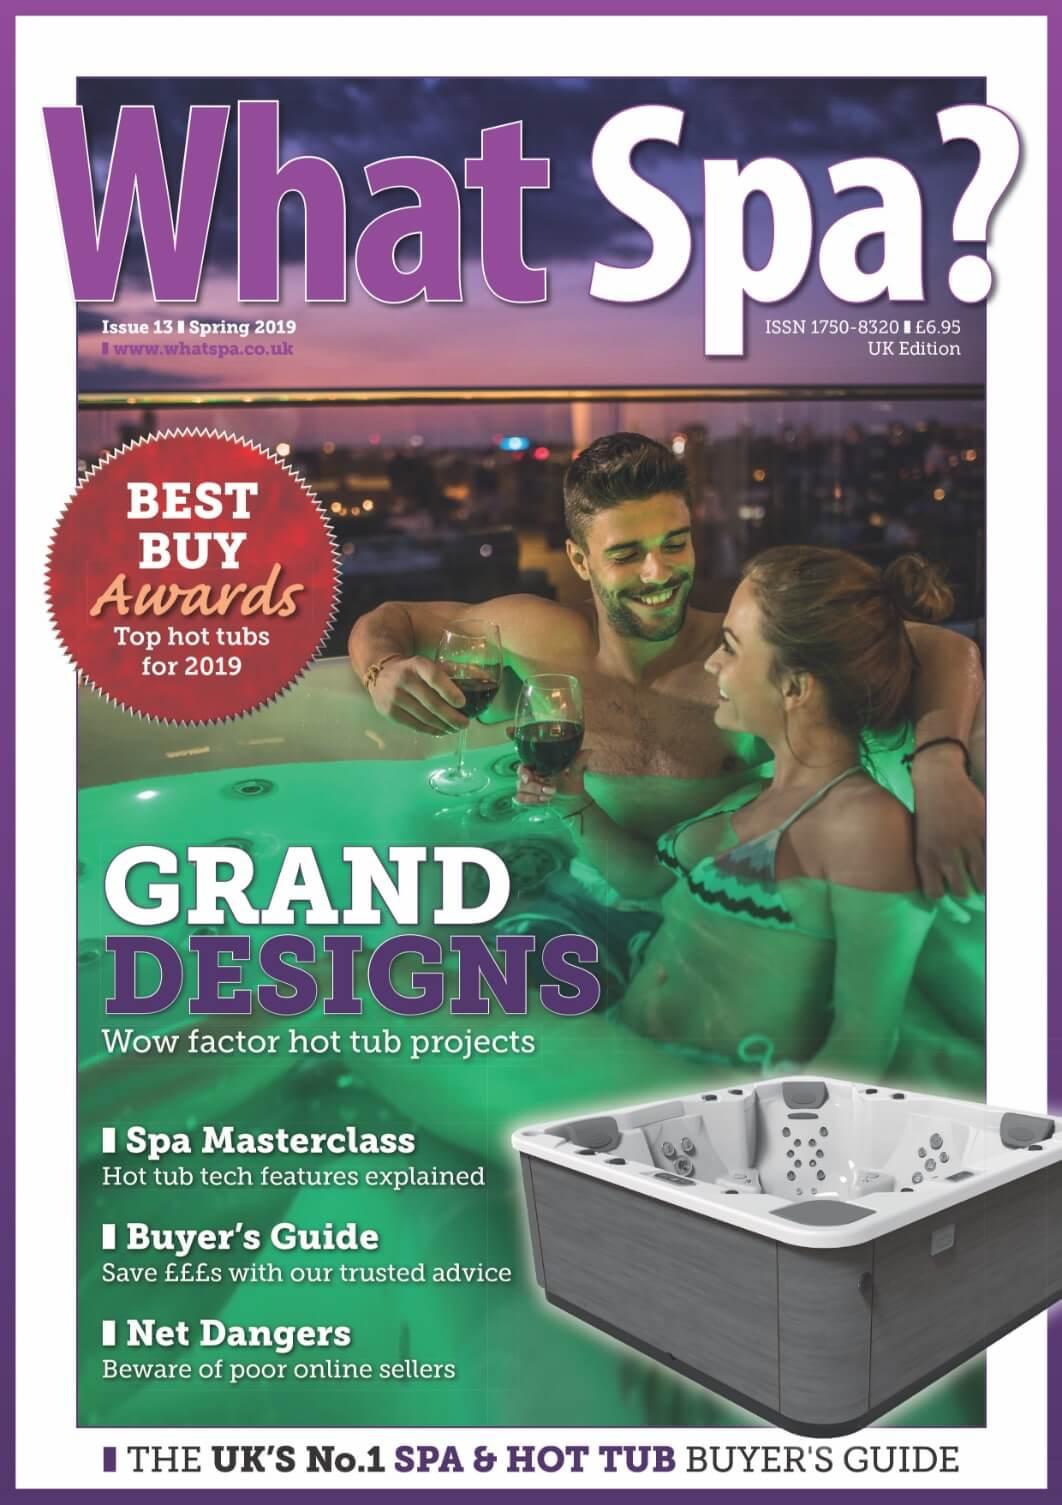 Latest WhatSpa? magazine cover